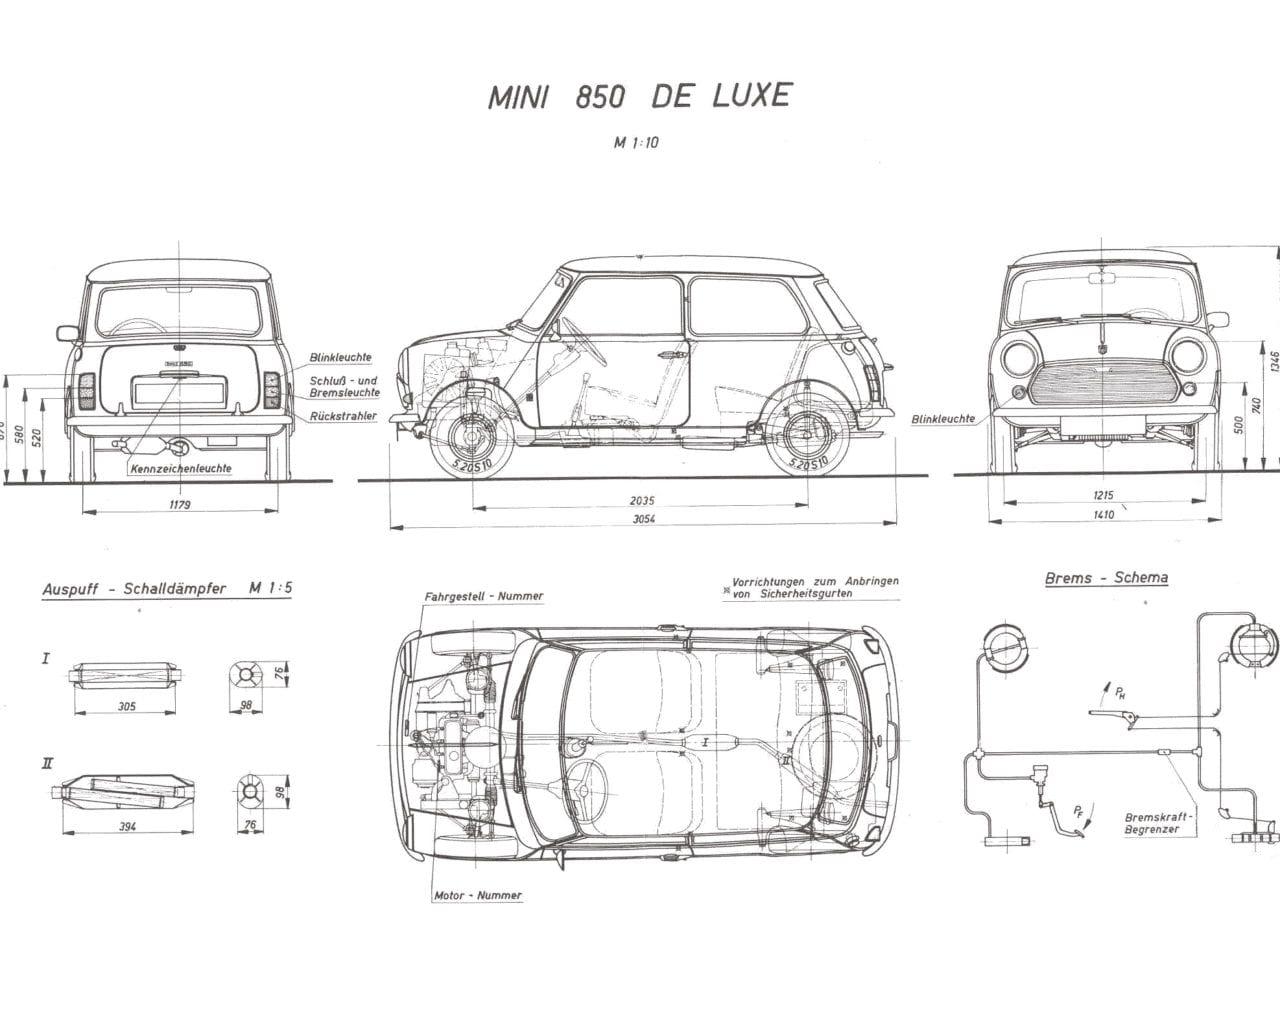 Great British Icons: The Classic Mini